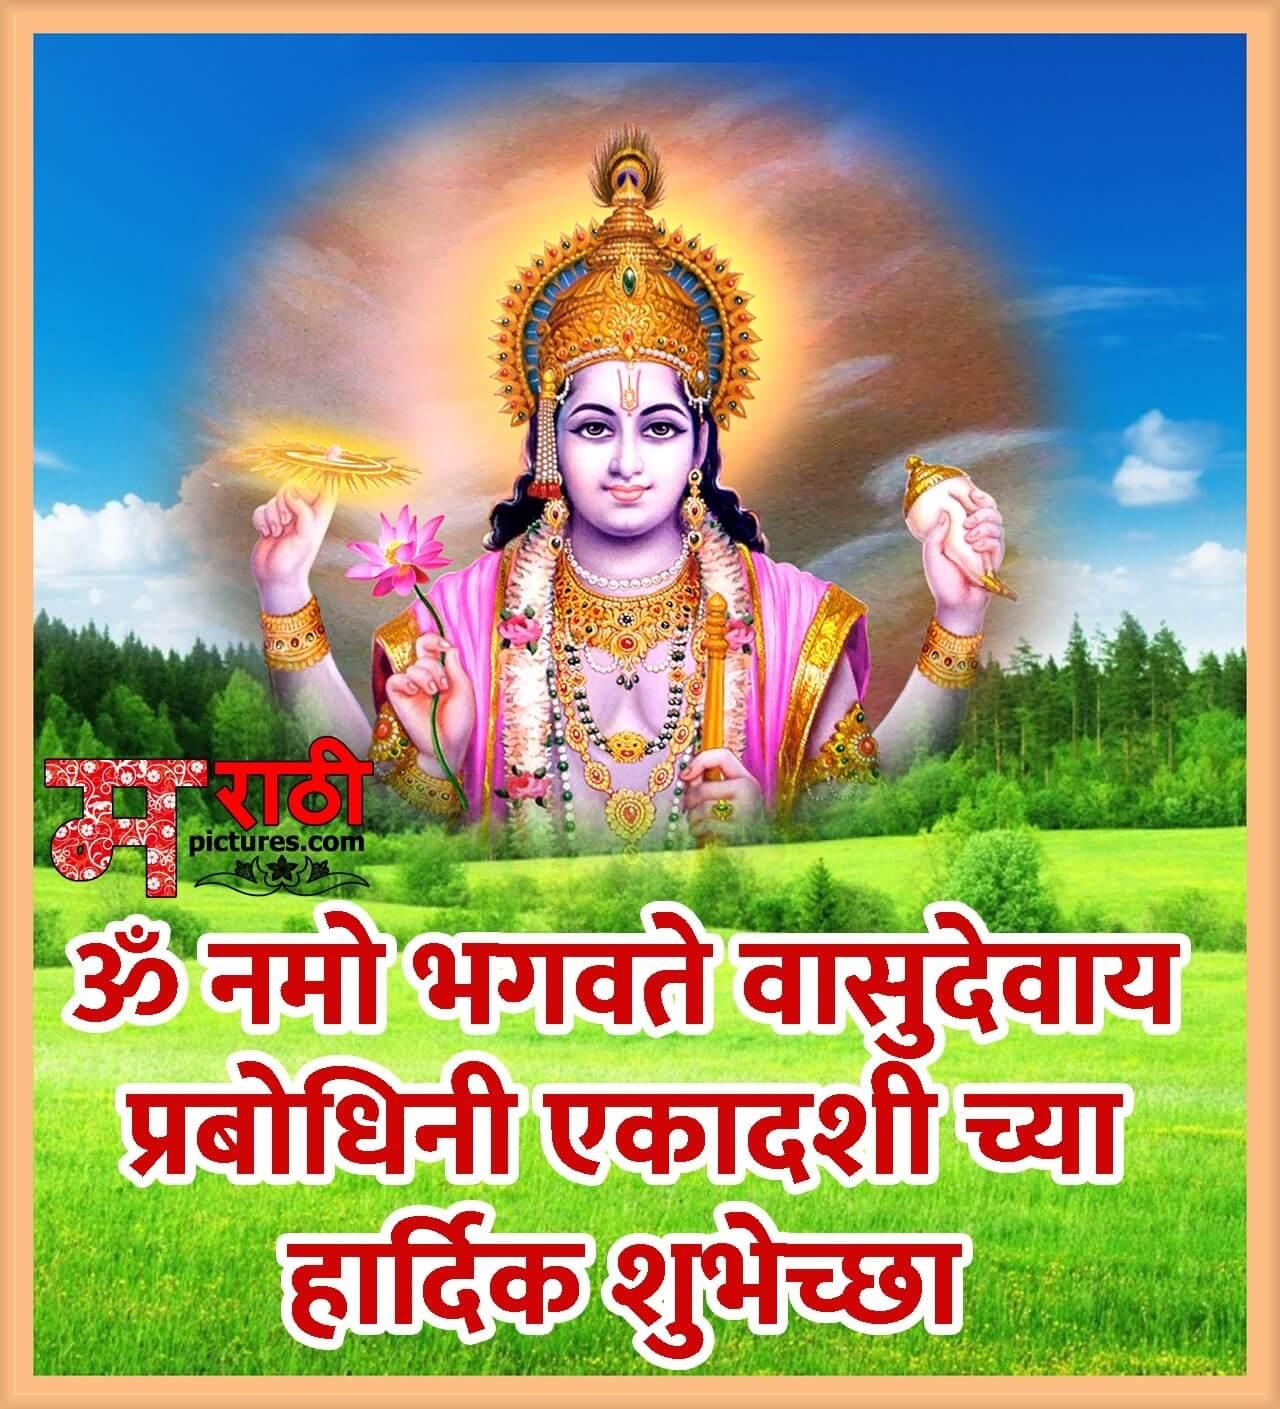 Prabodhini Ekadashi Chya Hardik Shubhechha - Marathi ... Vadhdivas Chya Hardik Shubhechha